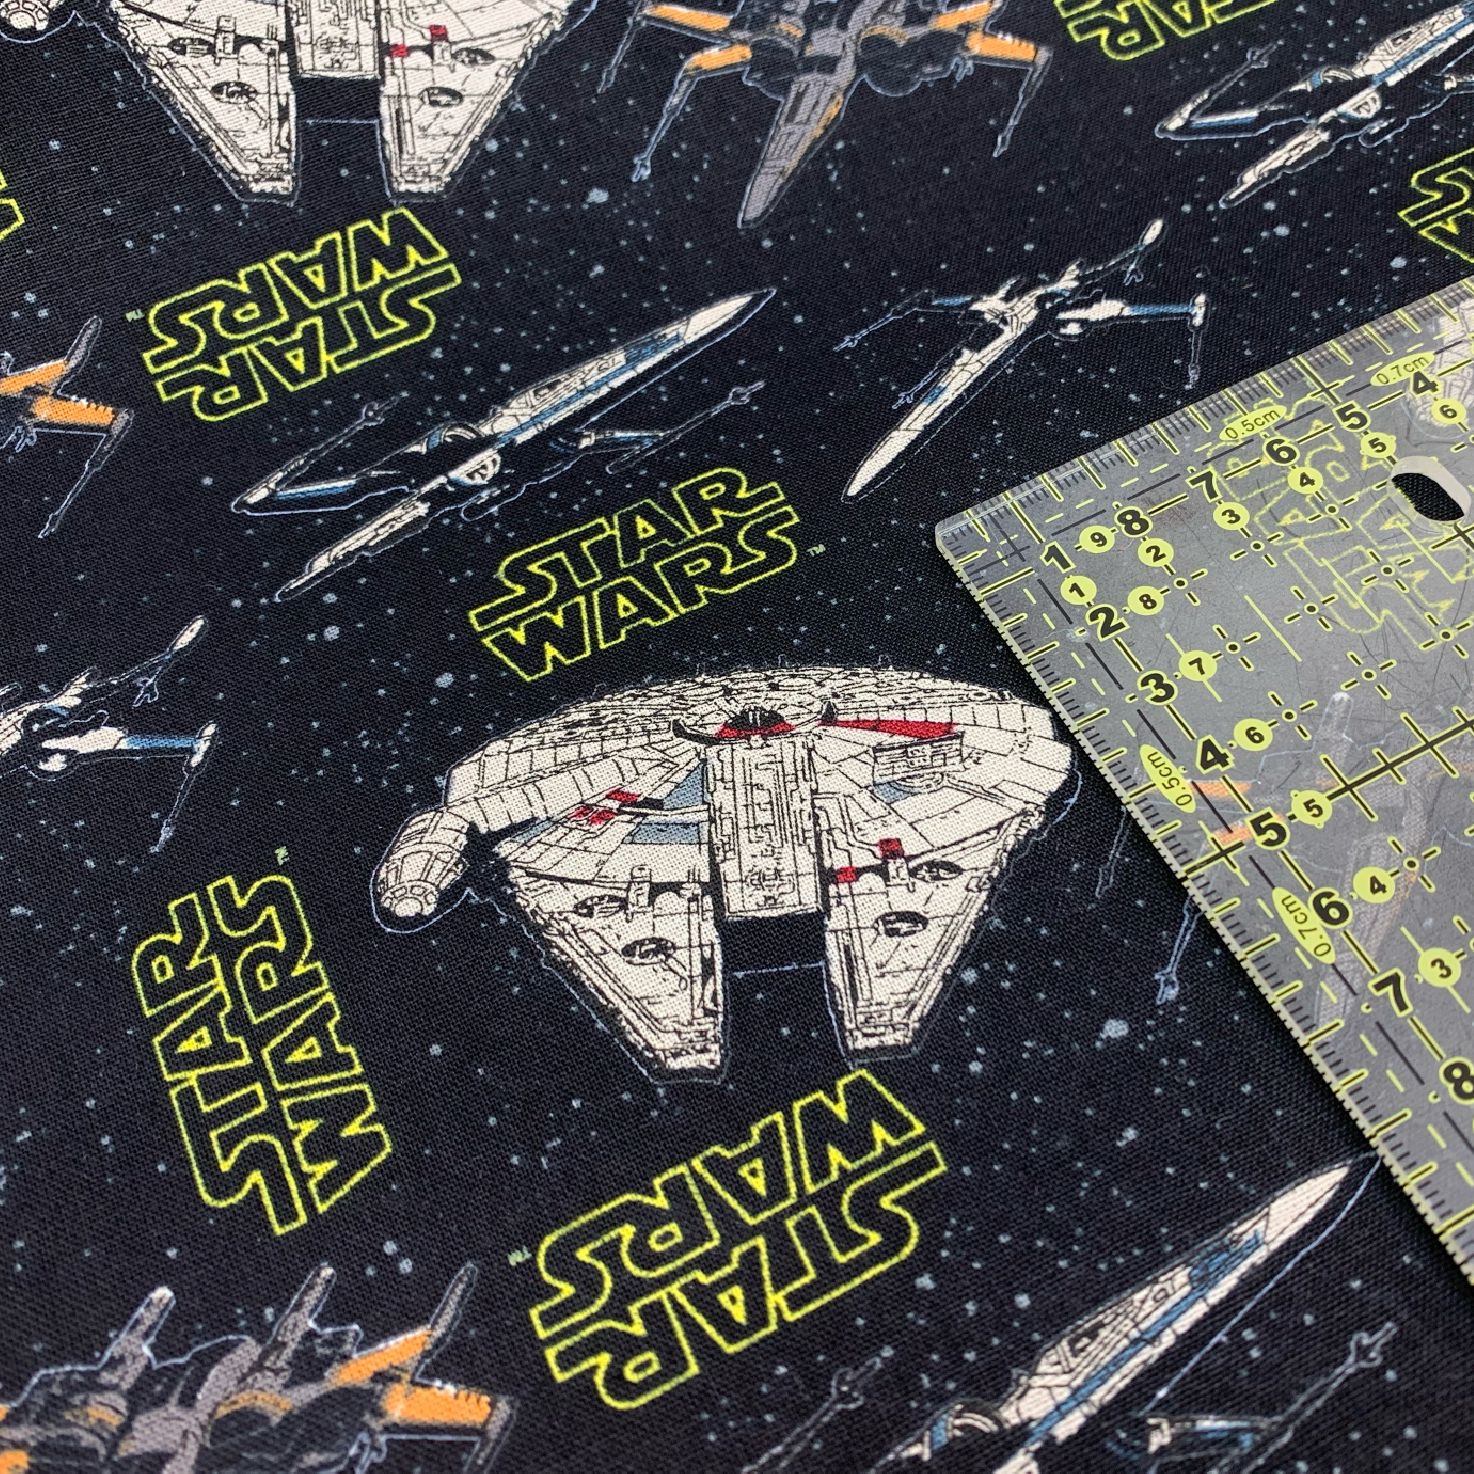 Star Wars - Rebel ships